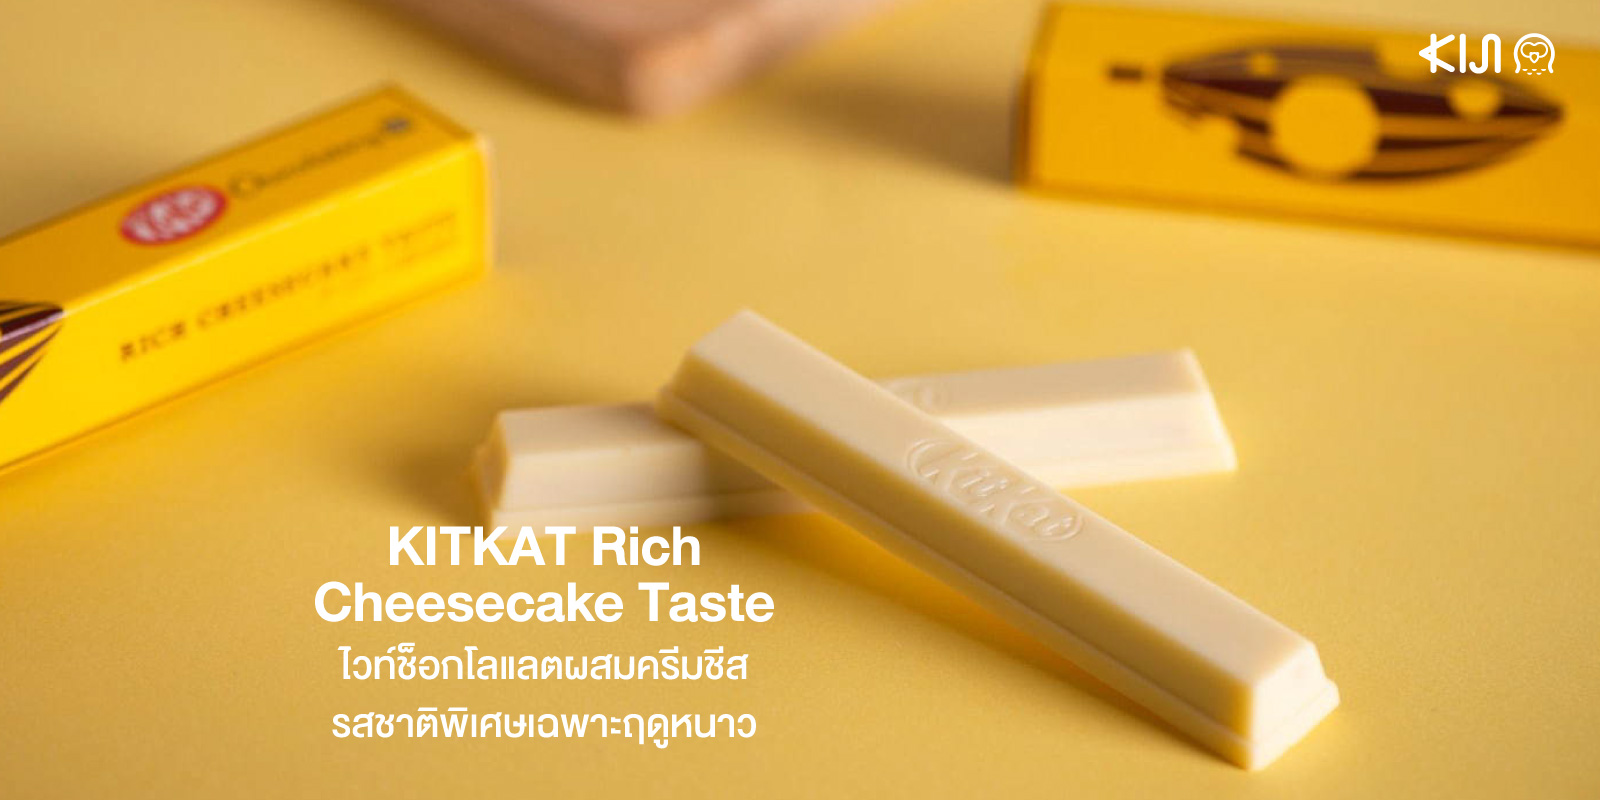 KITKAT Rich Cheesecake Taste คิทแคทรสชาติพิเศษเฉพาะฤดูหนาว